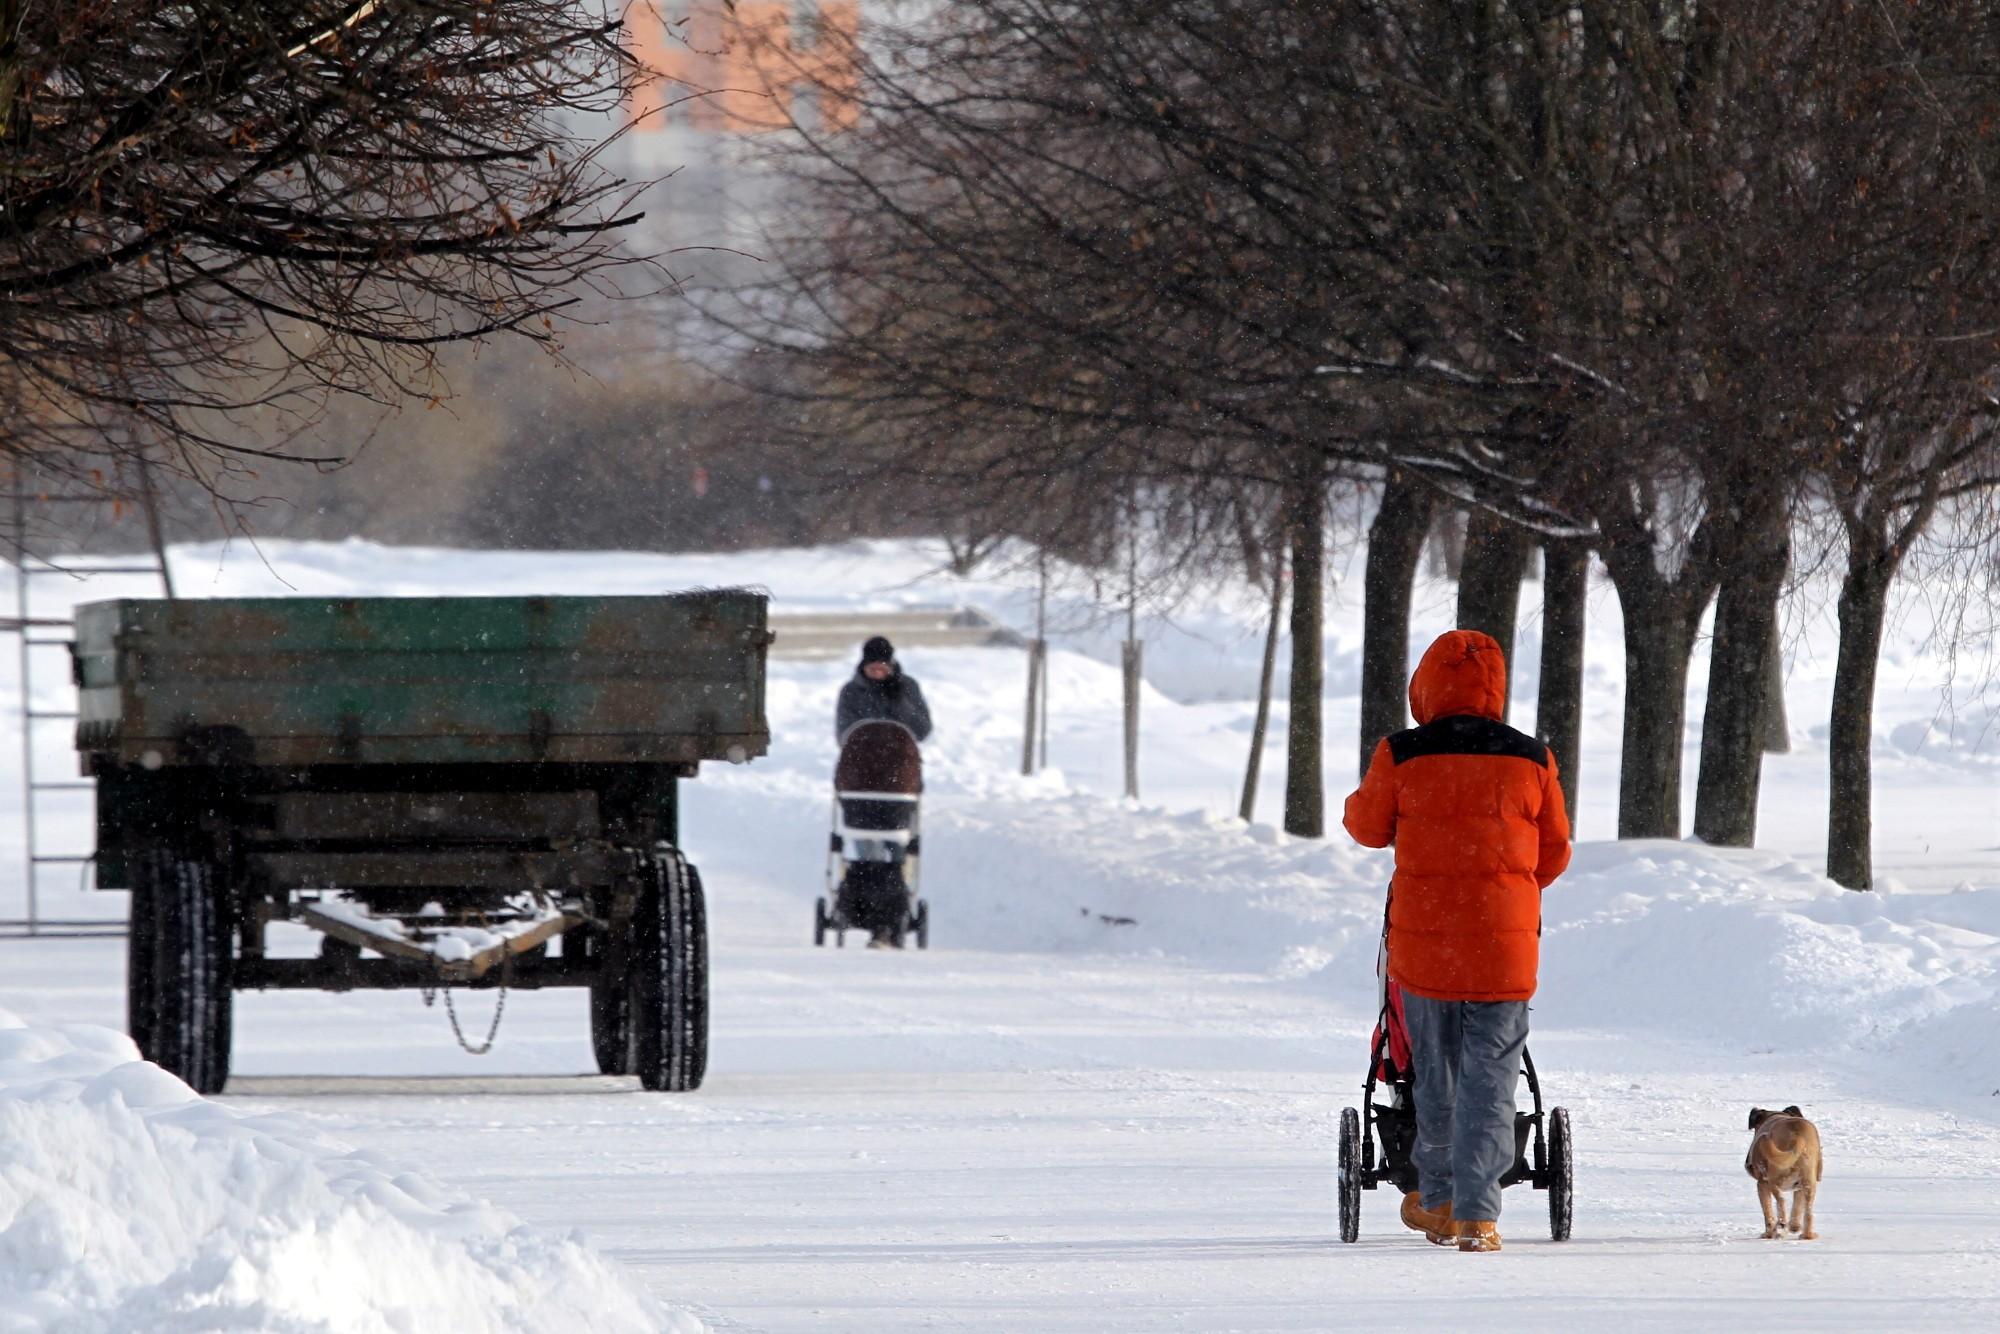 парк интернационалистов новостройки зима снегопад мама с коляской дети